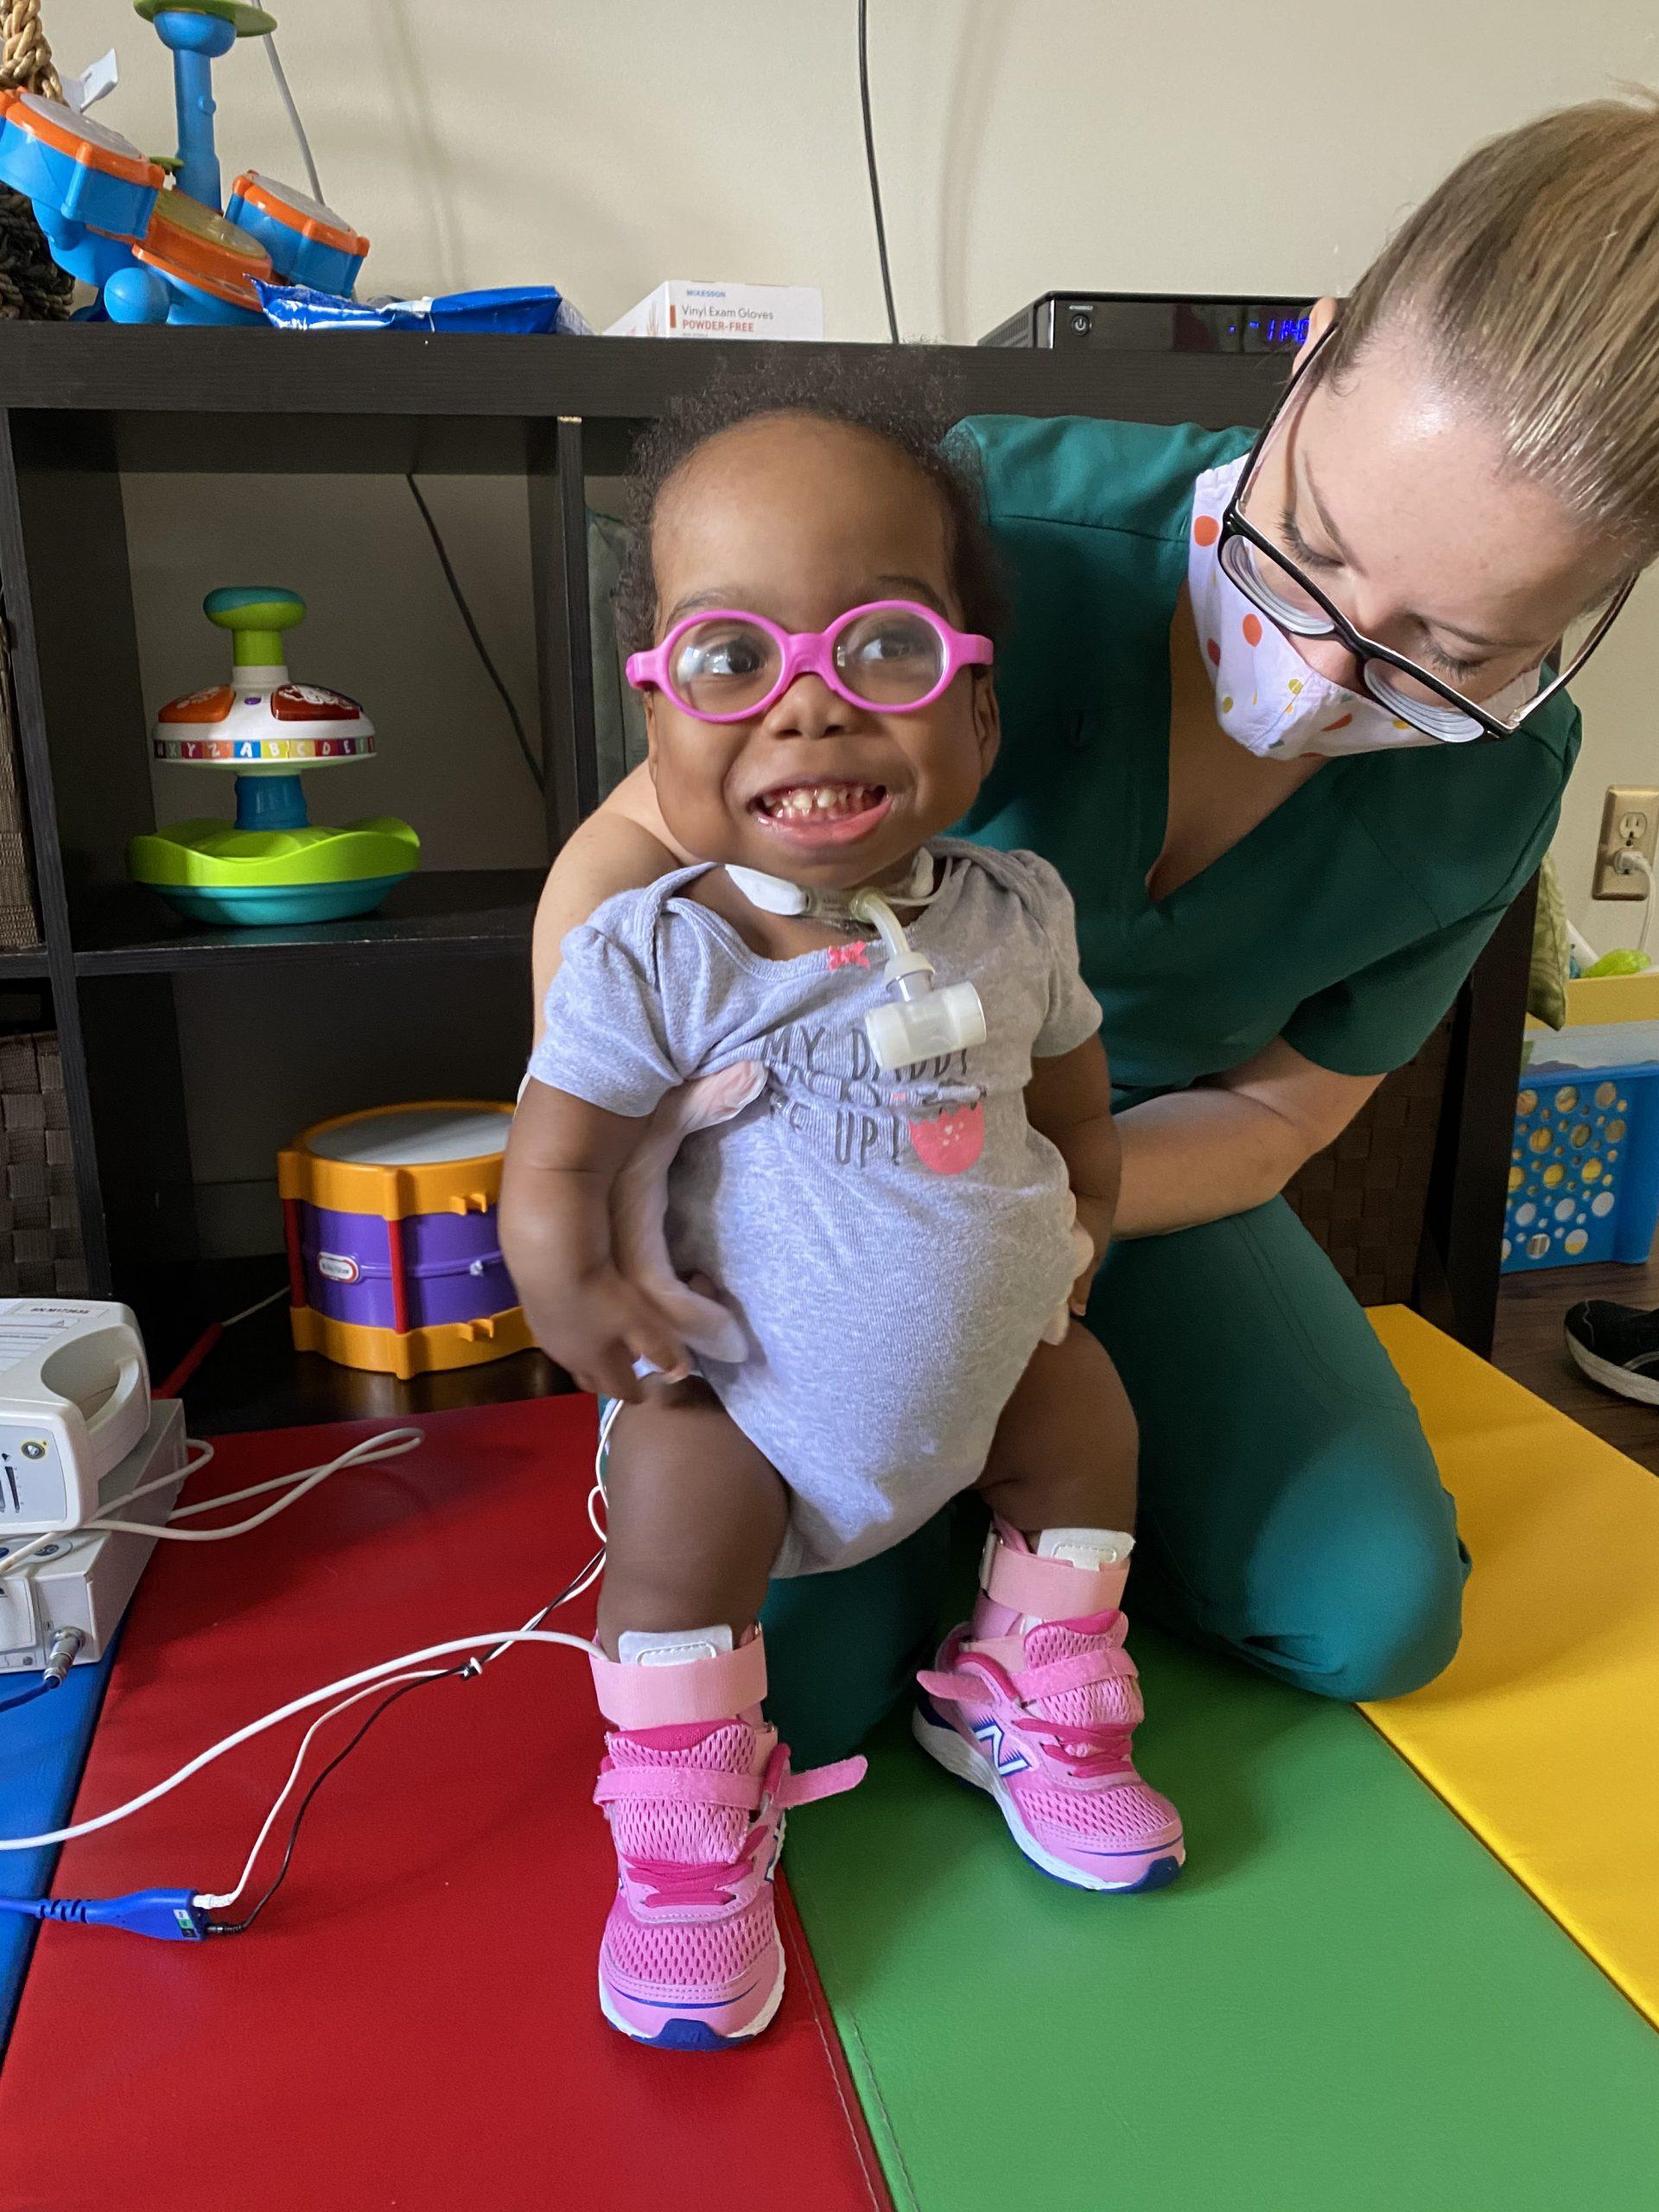 medically complex child